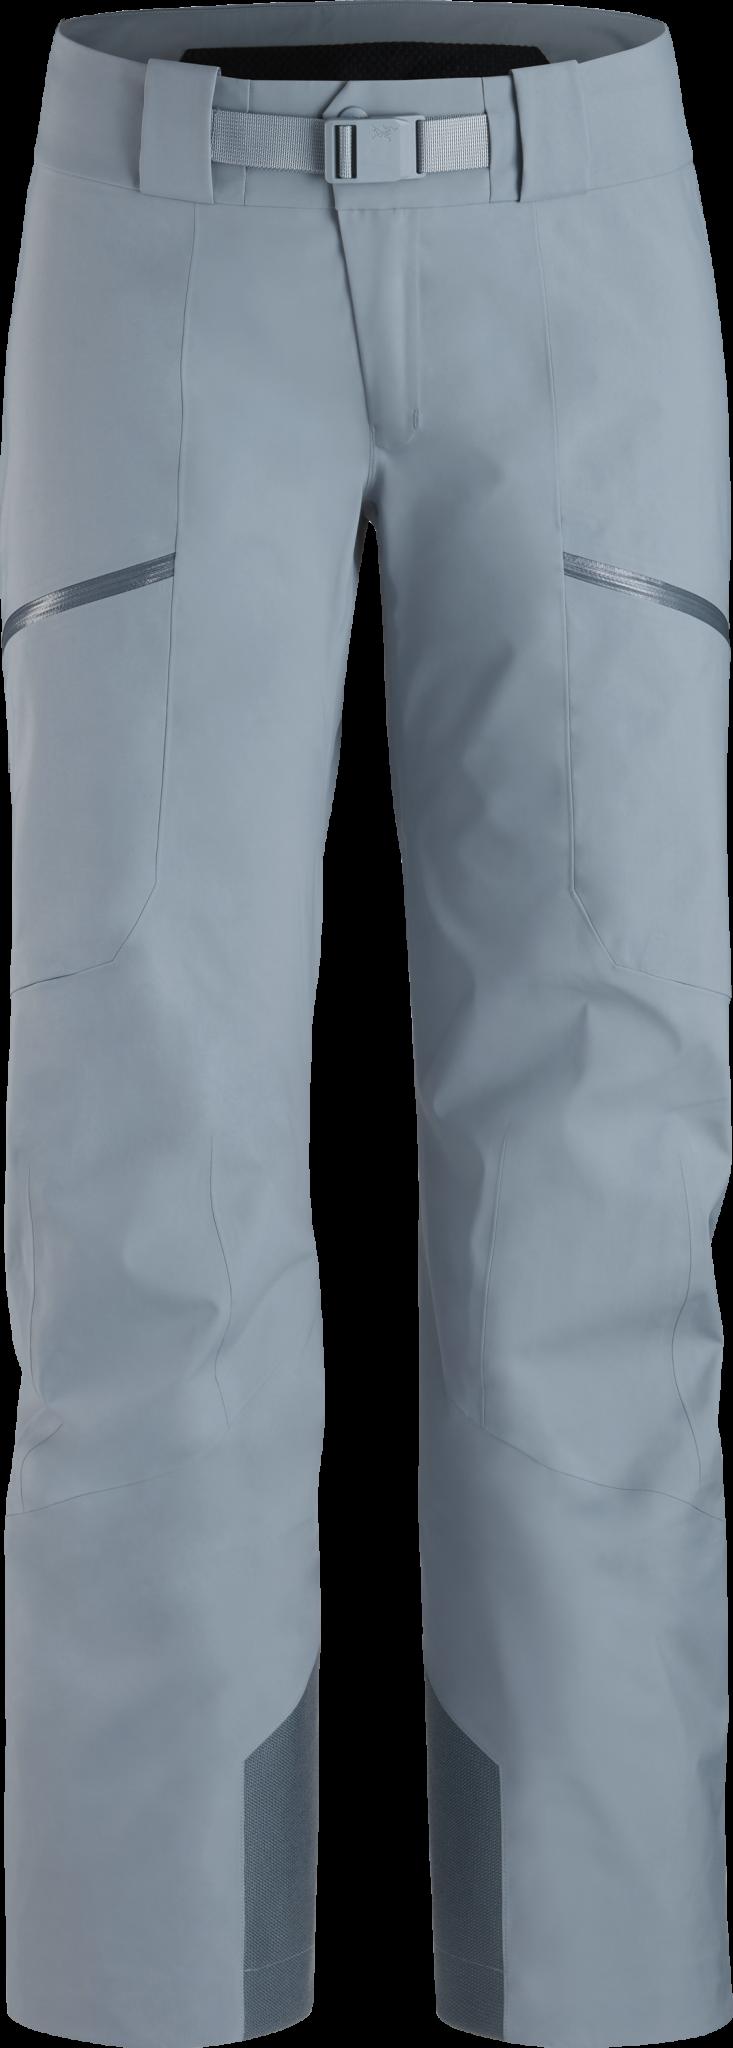 Arc'teryx Sentinel AR Pant Women's-1